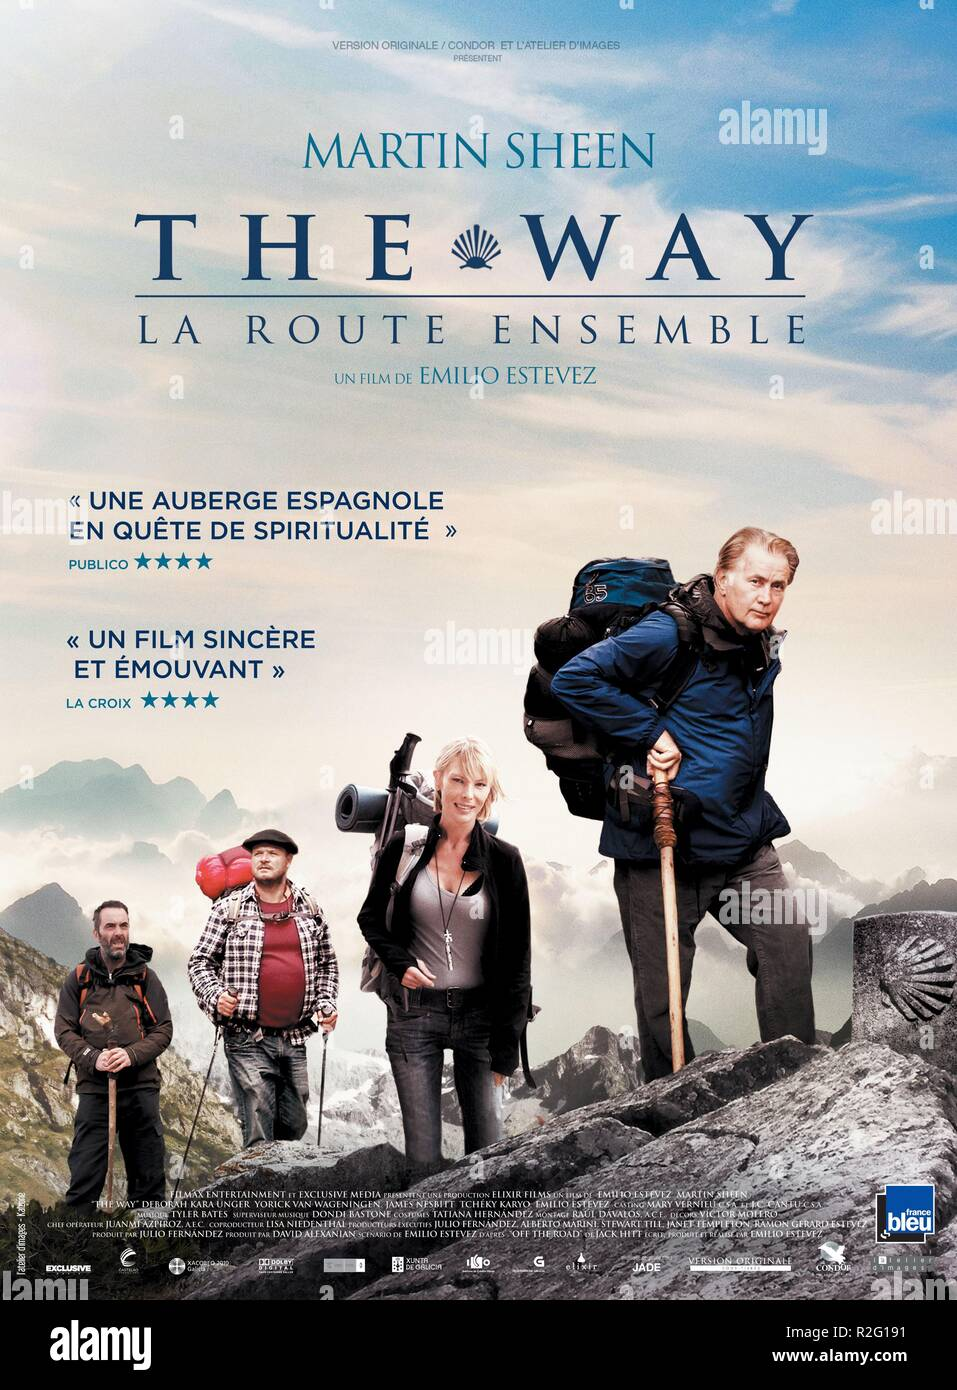 The Way, La Route Ensemble : route, ensemble, Spain, Director, Emilio, Estevez, Deborah, Unger,, James, Nesbitt,, Yorick, Wageningen,, Martin, Sheen, Movie, Poster, Stock, Photo, Alamy